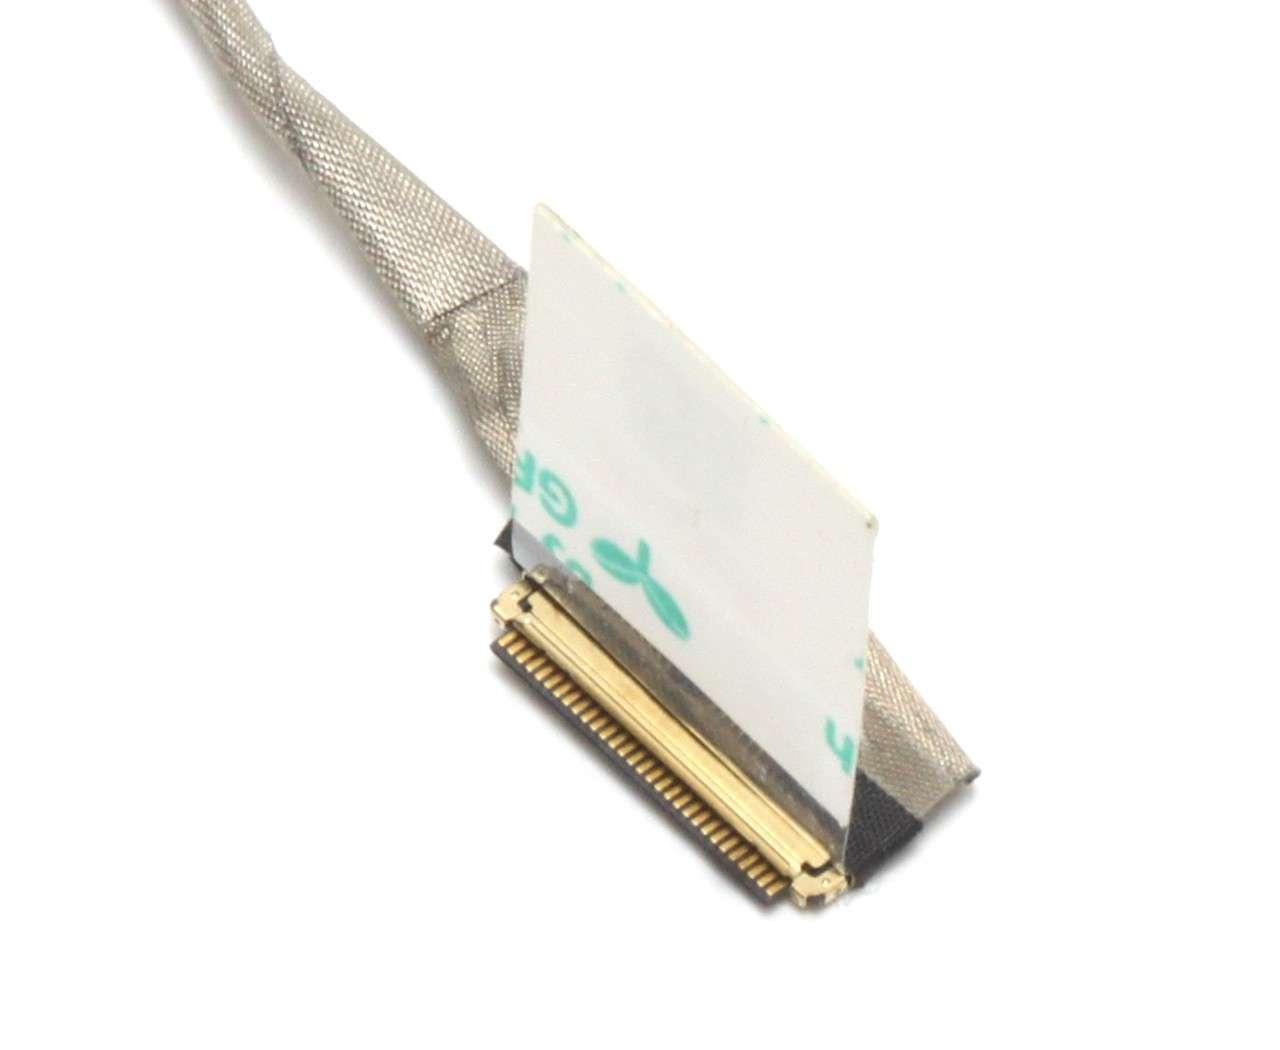 Cablu video LVDS Acer Extensa 2511G 30 pini FULL HD 1920x1080 fara touchscreen imagine powerlaptop.ro 2021